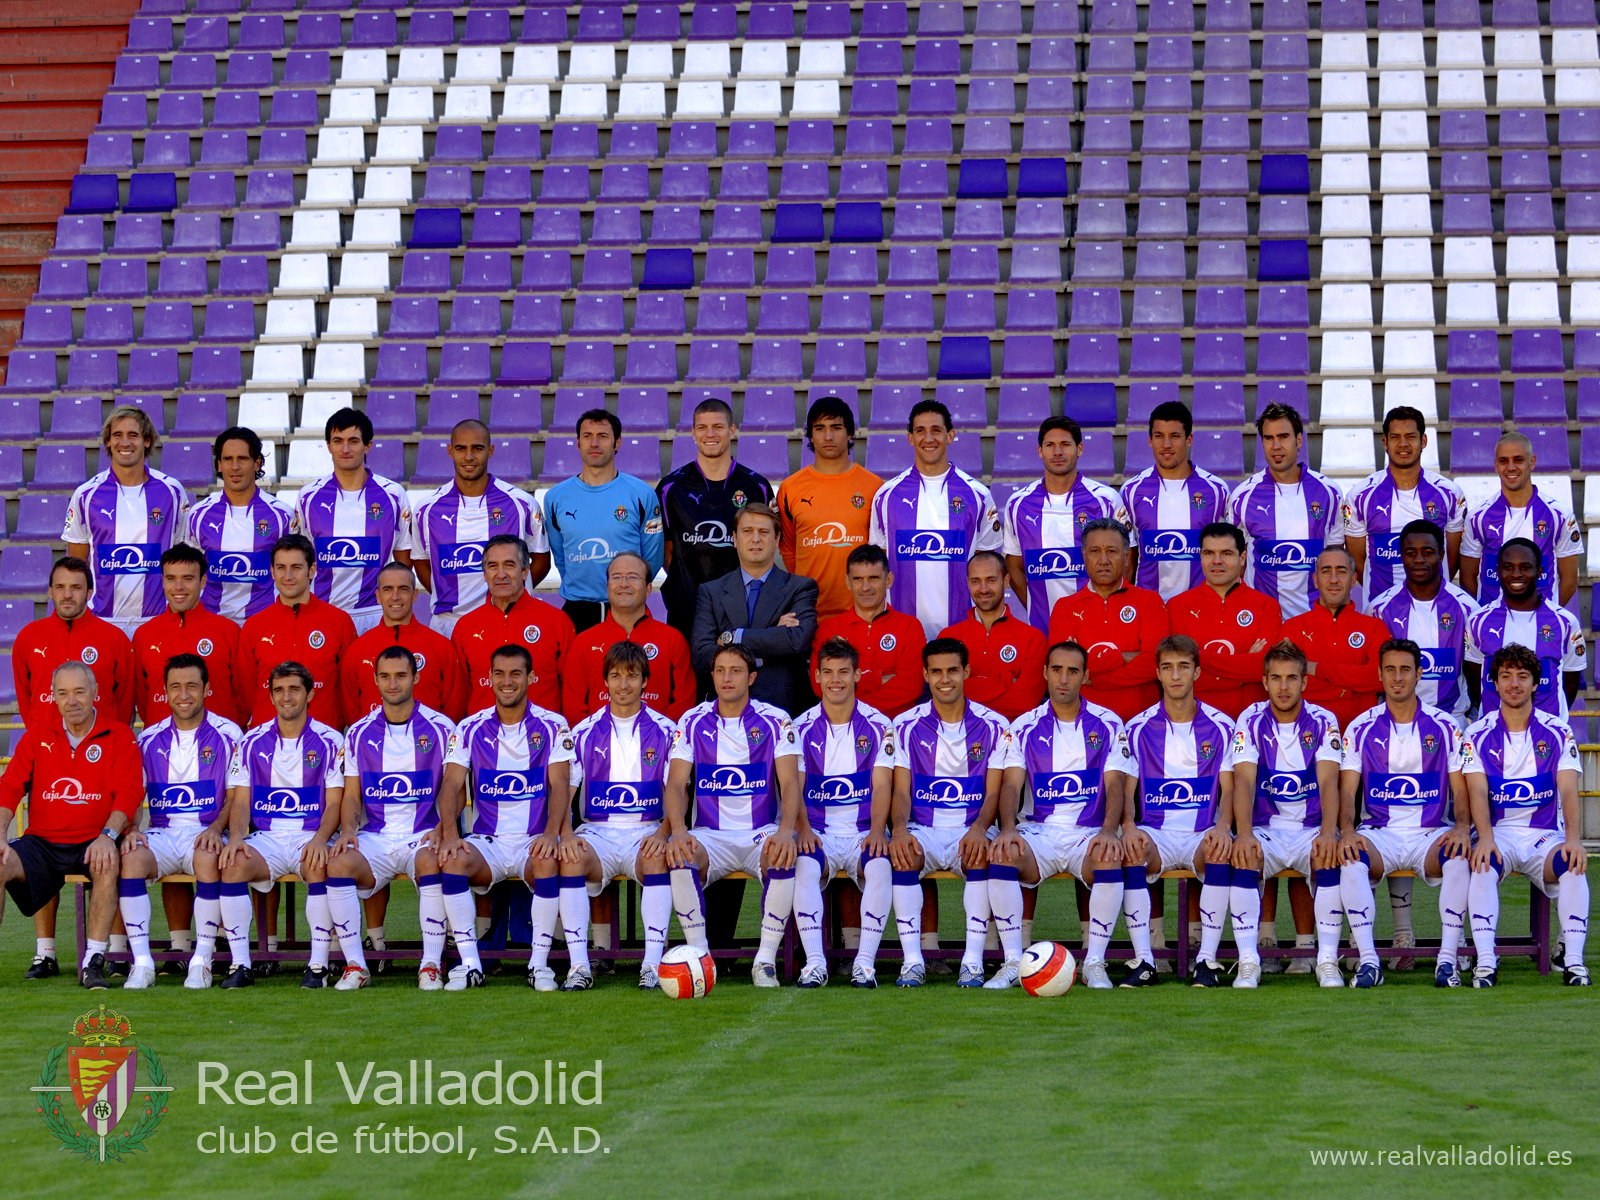 ¿Cuánto mide Sergio Asenjo? - Altura - Real height Valladolid%2B2007%2B08%2B01